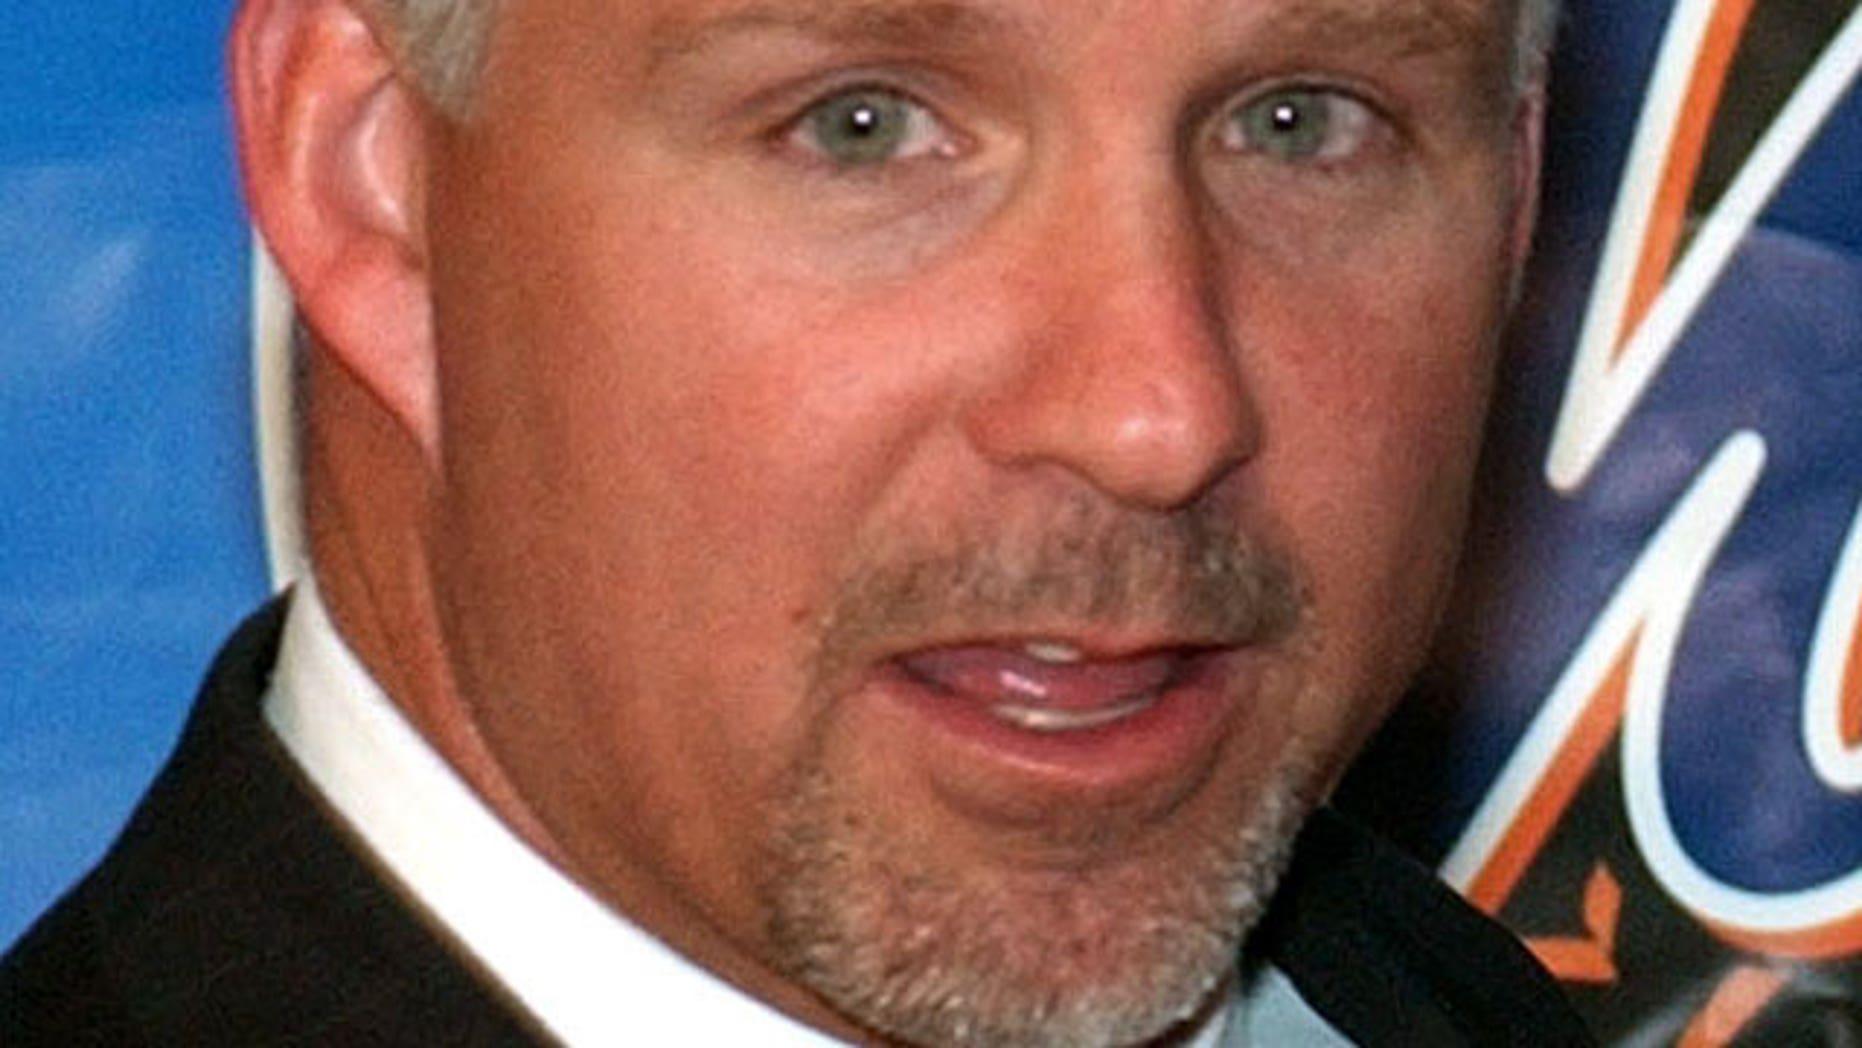 Formet Mets GM Steve Phillips